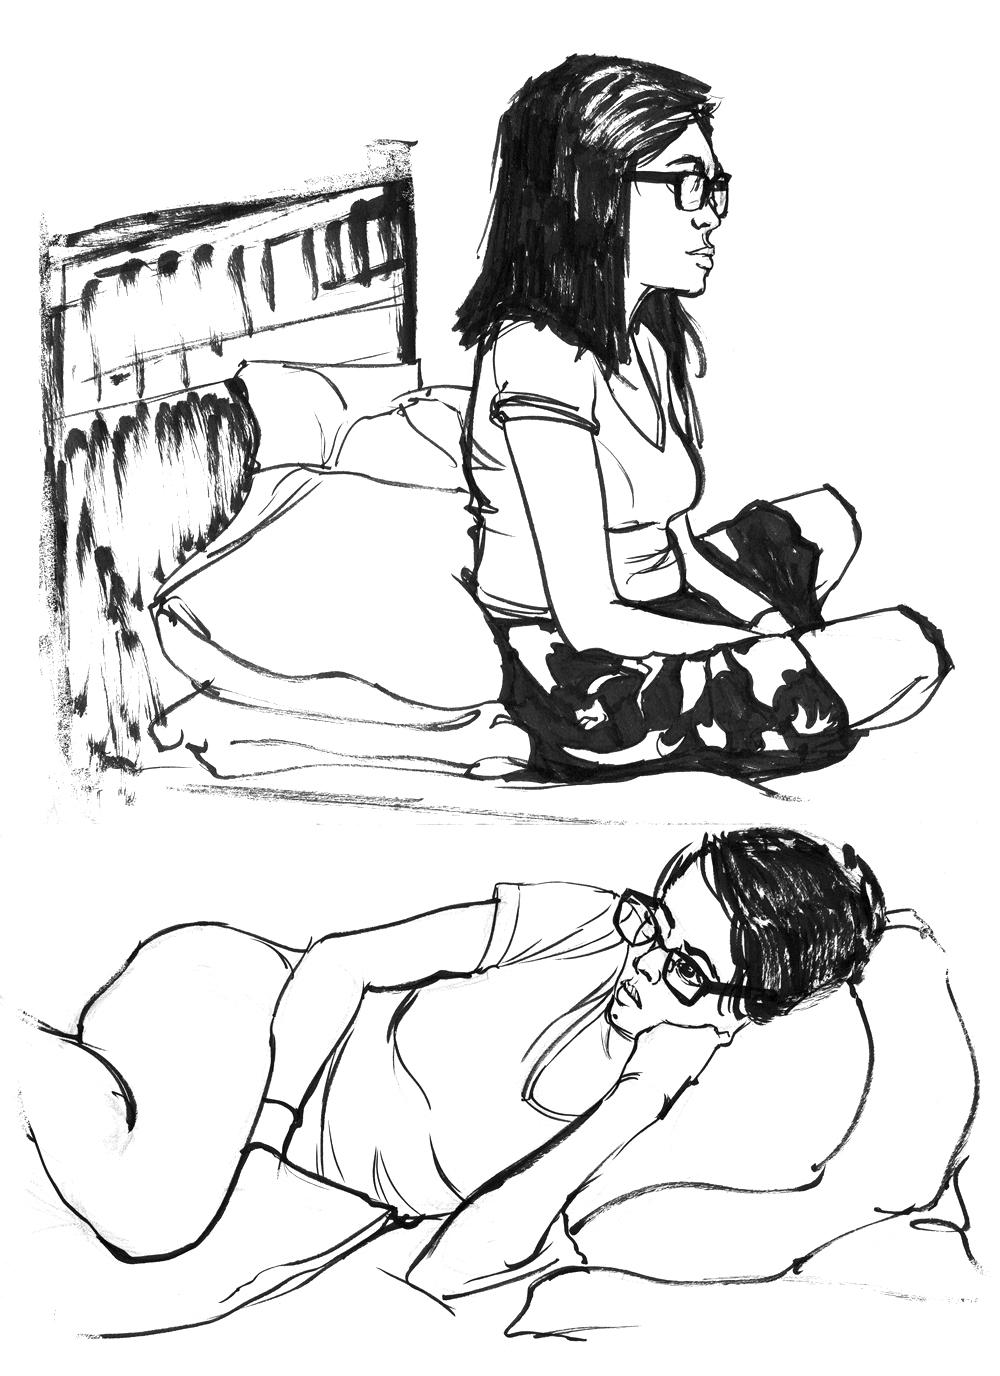 KstineSketch1.jpg